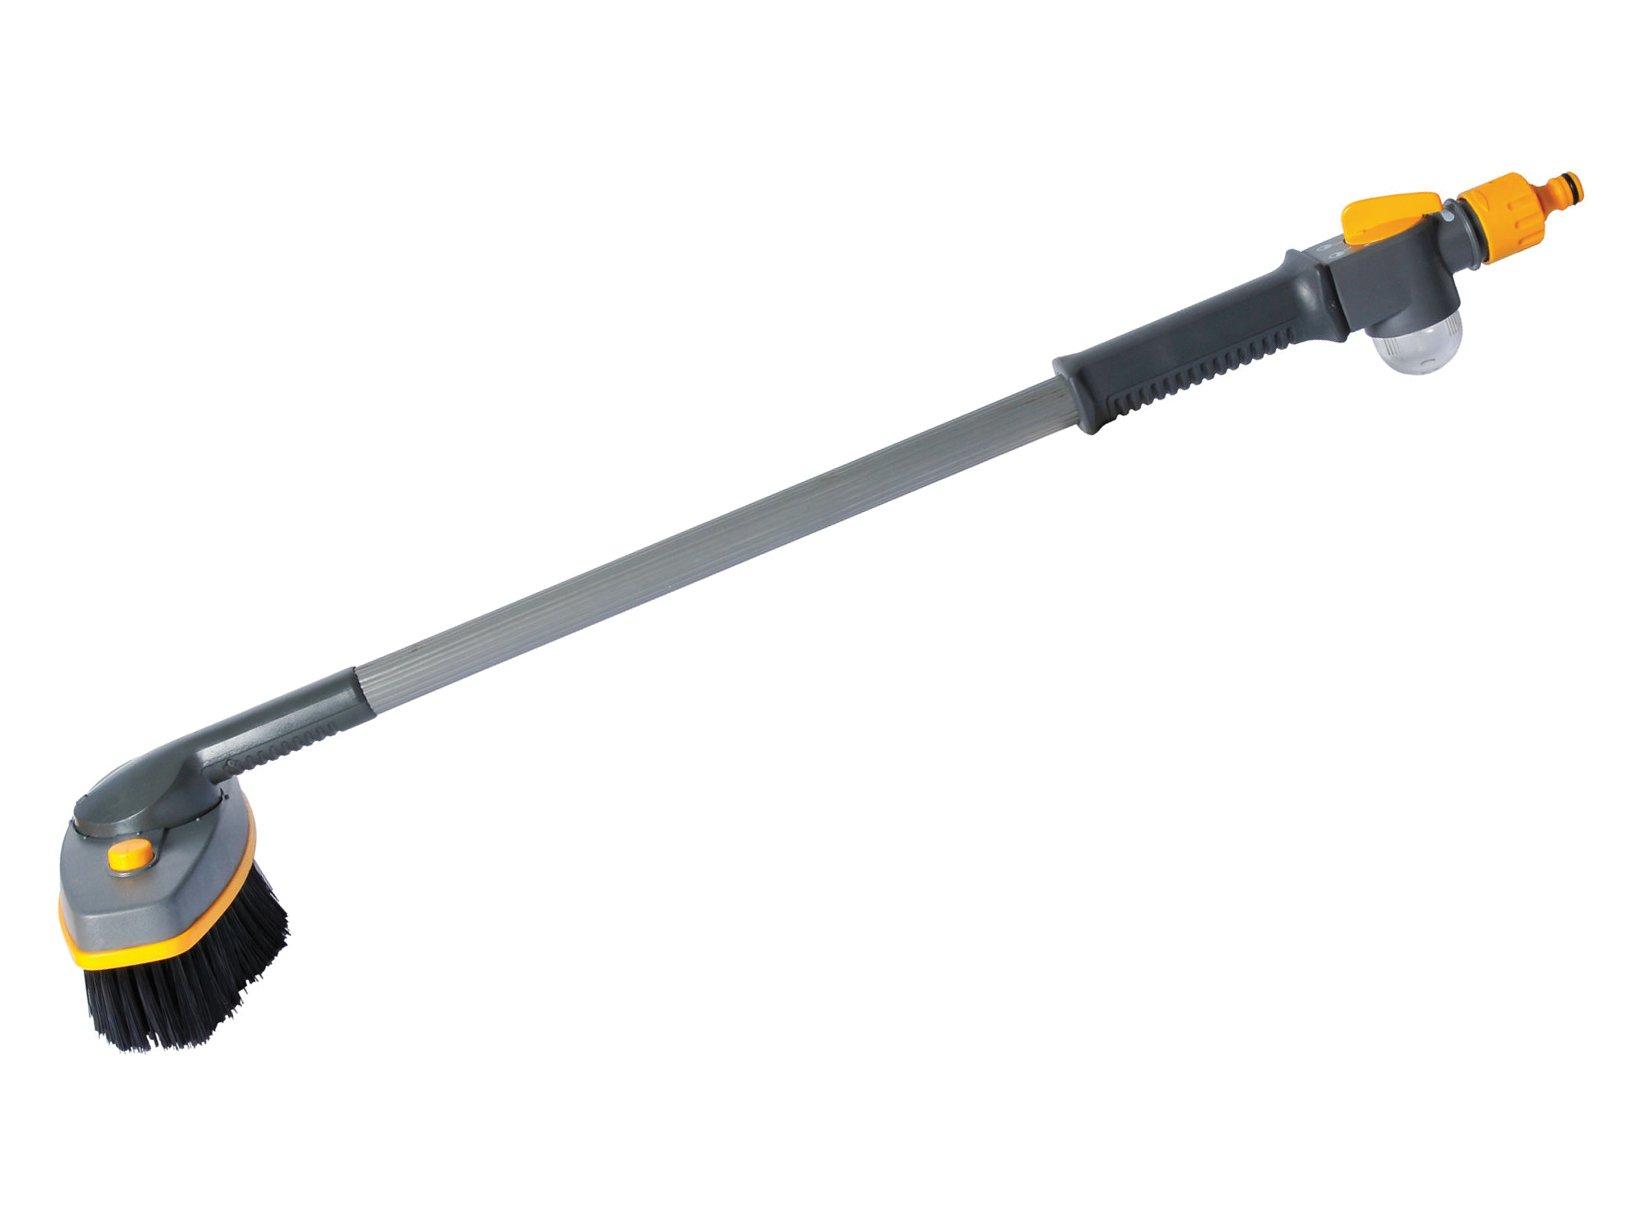 Hozelock Car Brush Plus Medium Car Cleaning Vehicles Motorbikes Maintenance